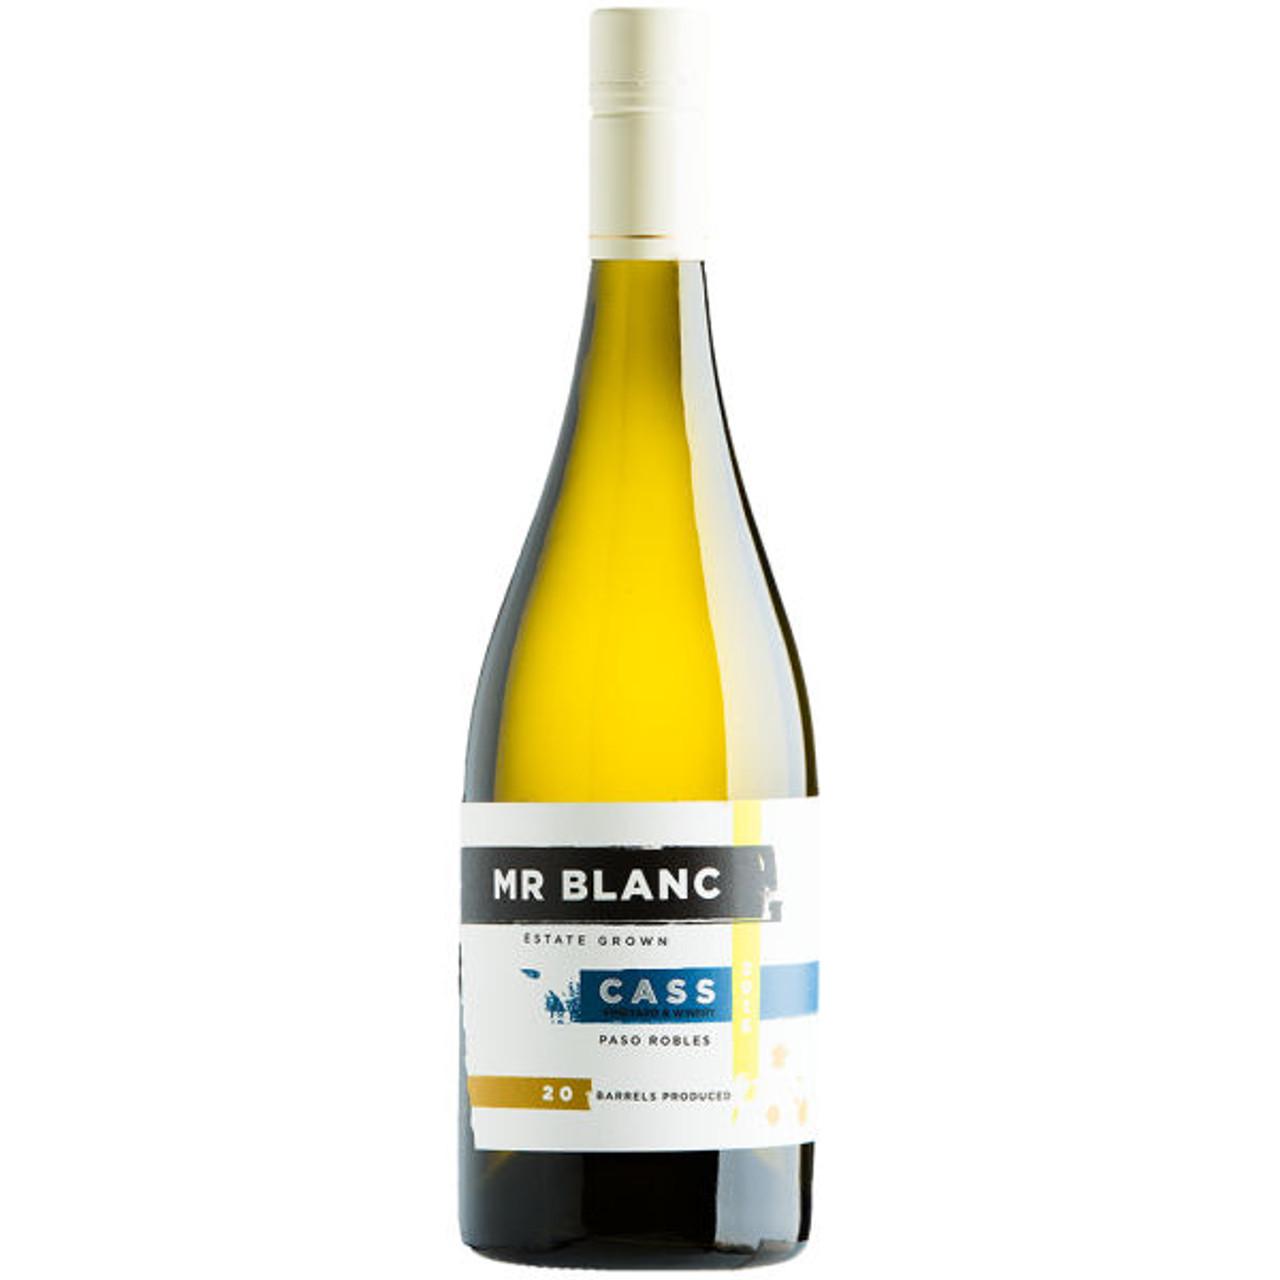 Cass Mr. Blanc Paso Robles White Blend